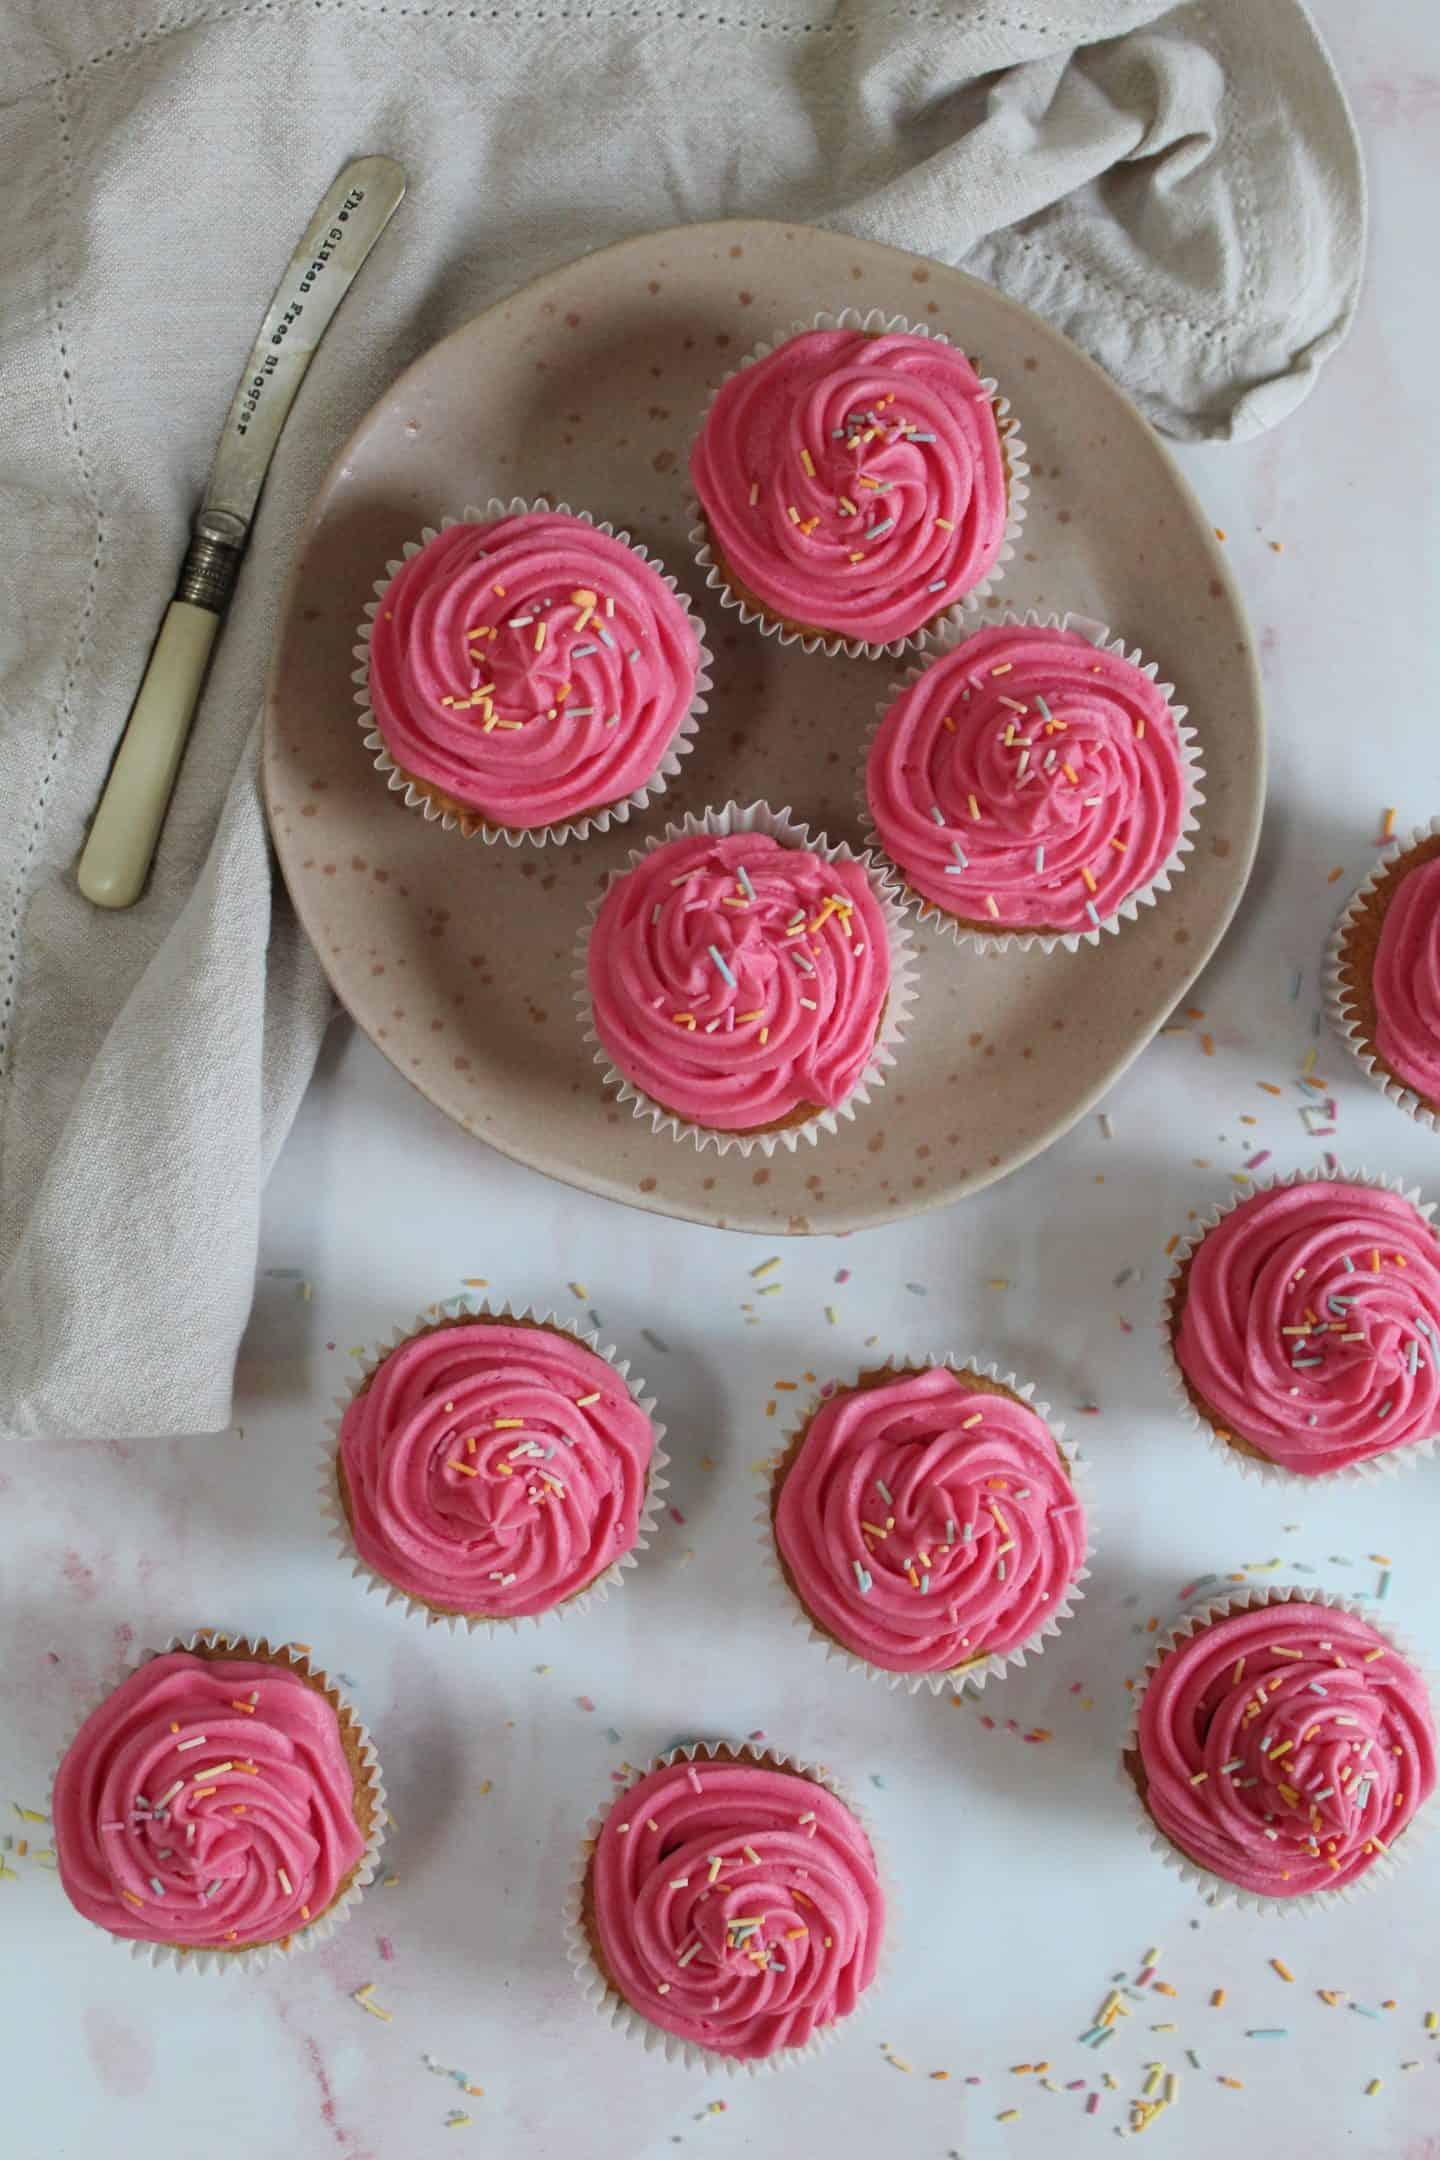 basic gluten free cupcake recipe vanilla buttercream frosting